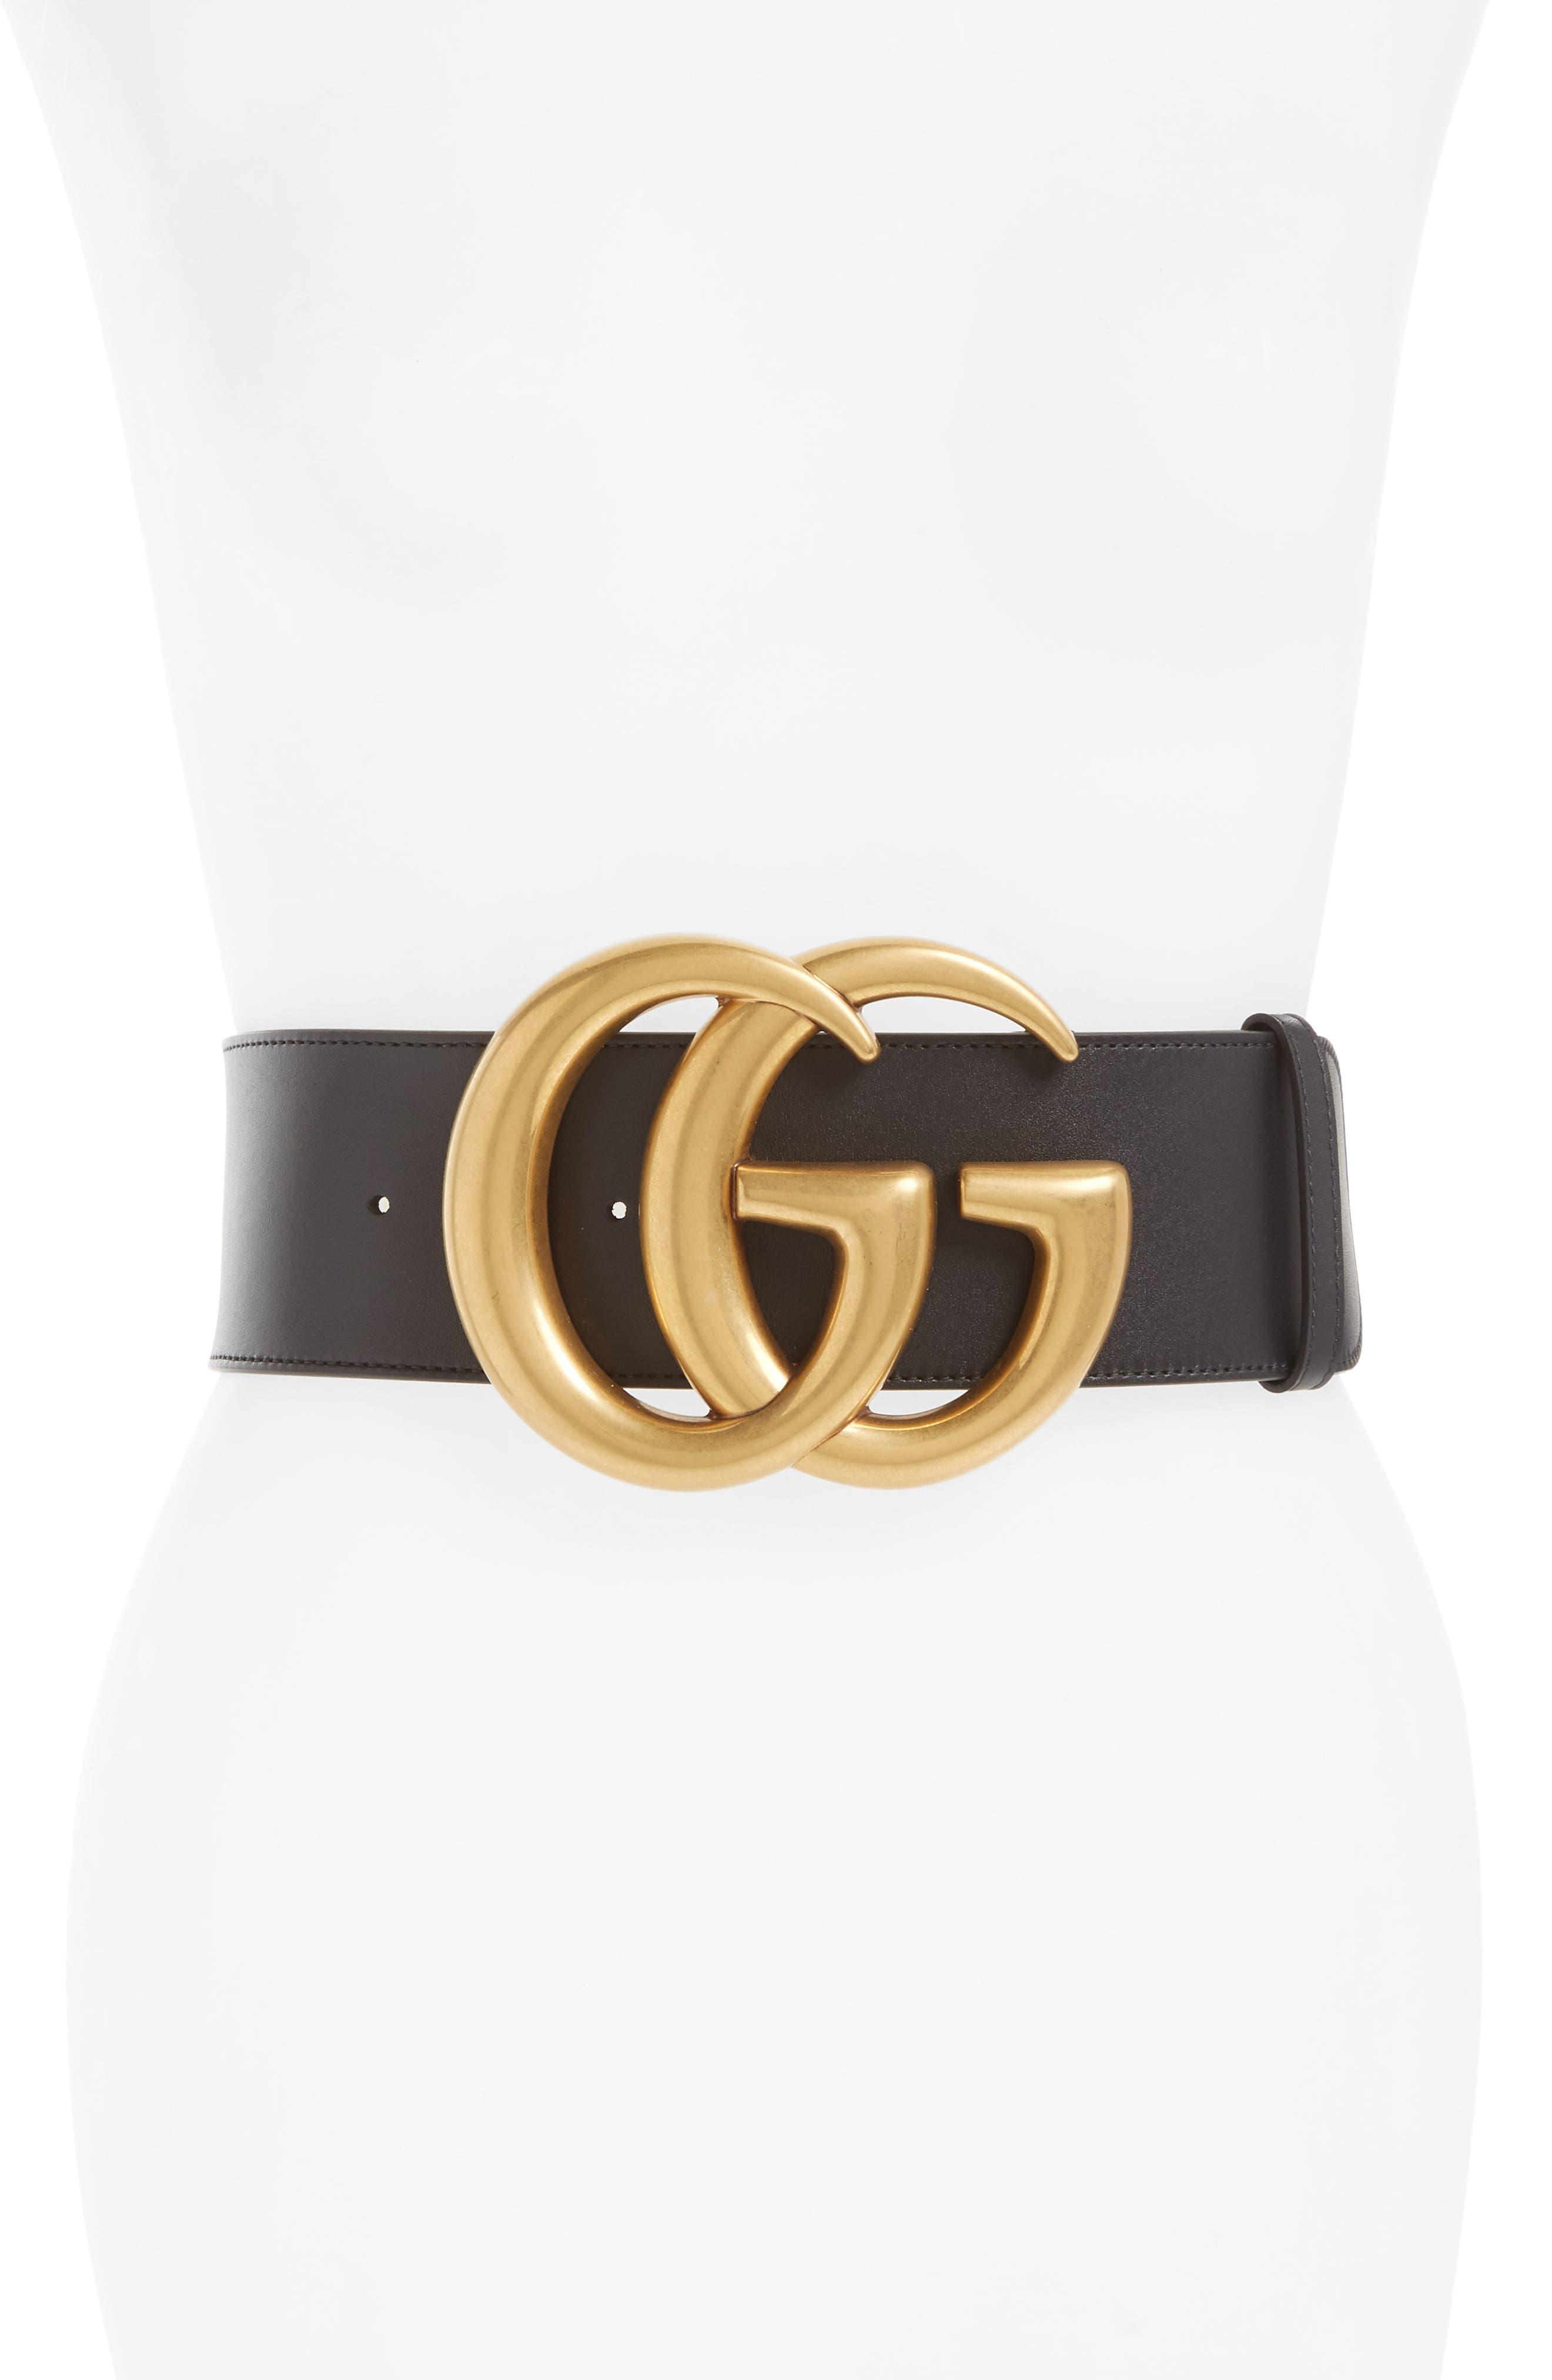 77b04f692d7 Gucci Designer Belts for Women